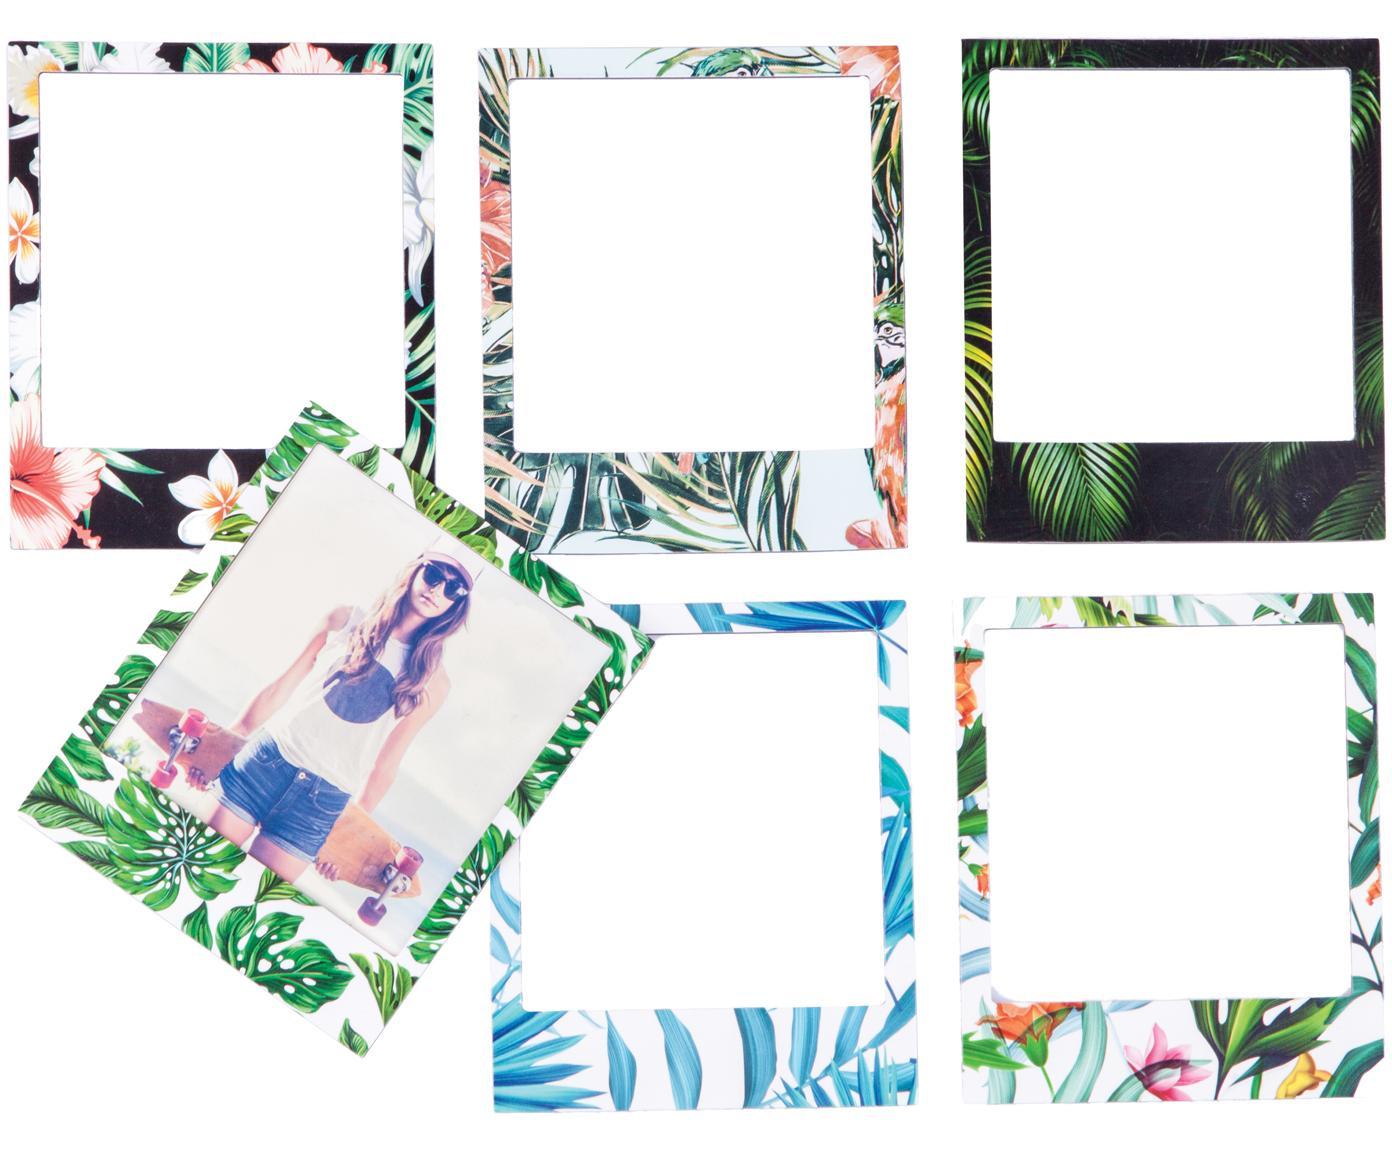 Bilderrahmen-Set Tropical, 6-tlg., Vorderseite: PVC, Rückseite: Magnet, Mehrfarbig, 6 x 9 cm